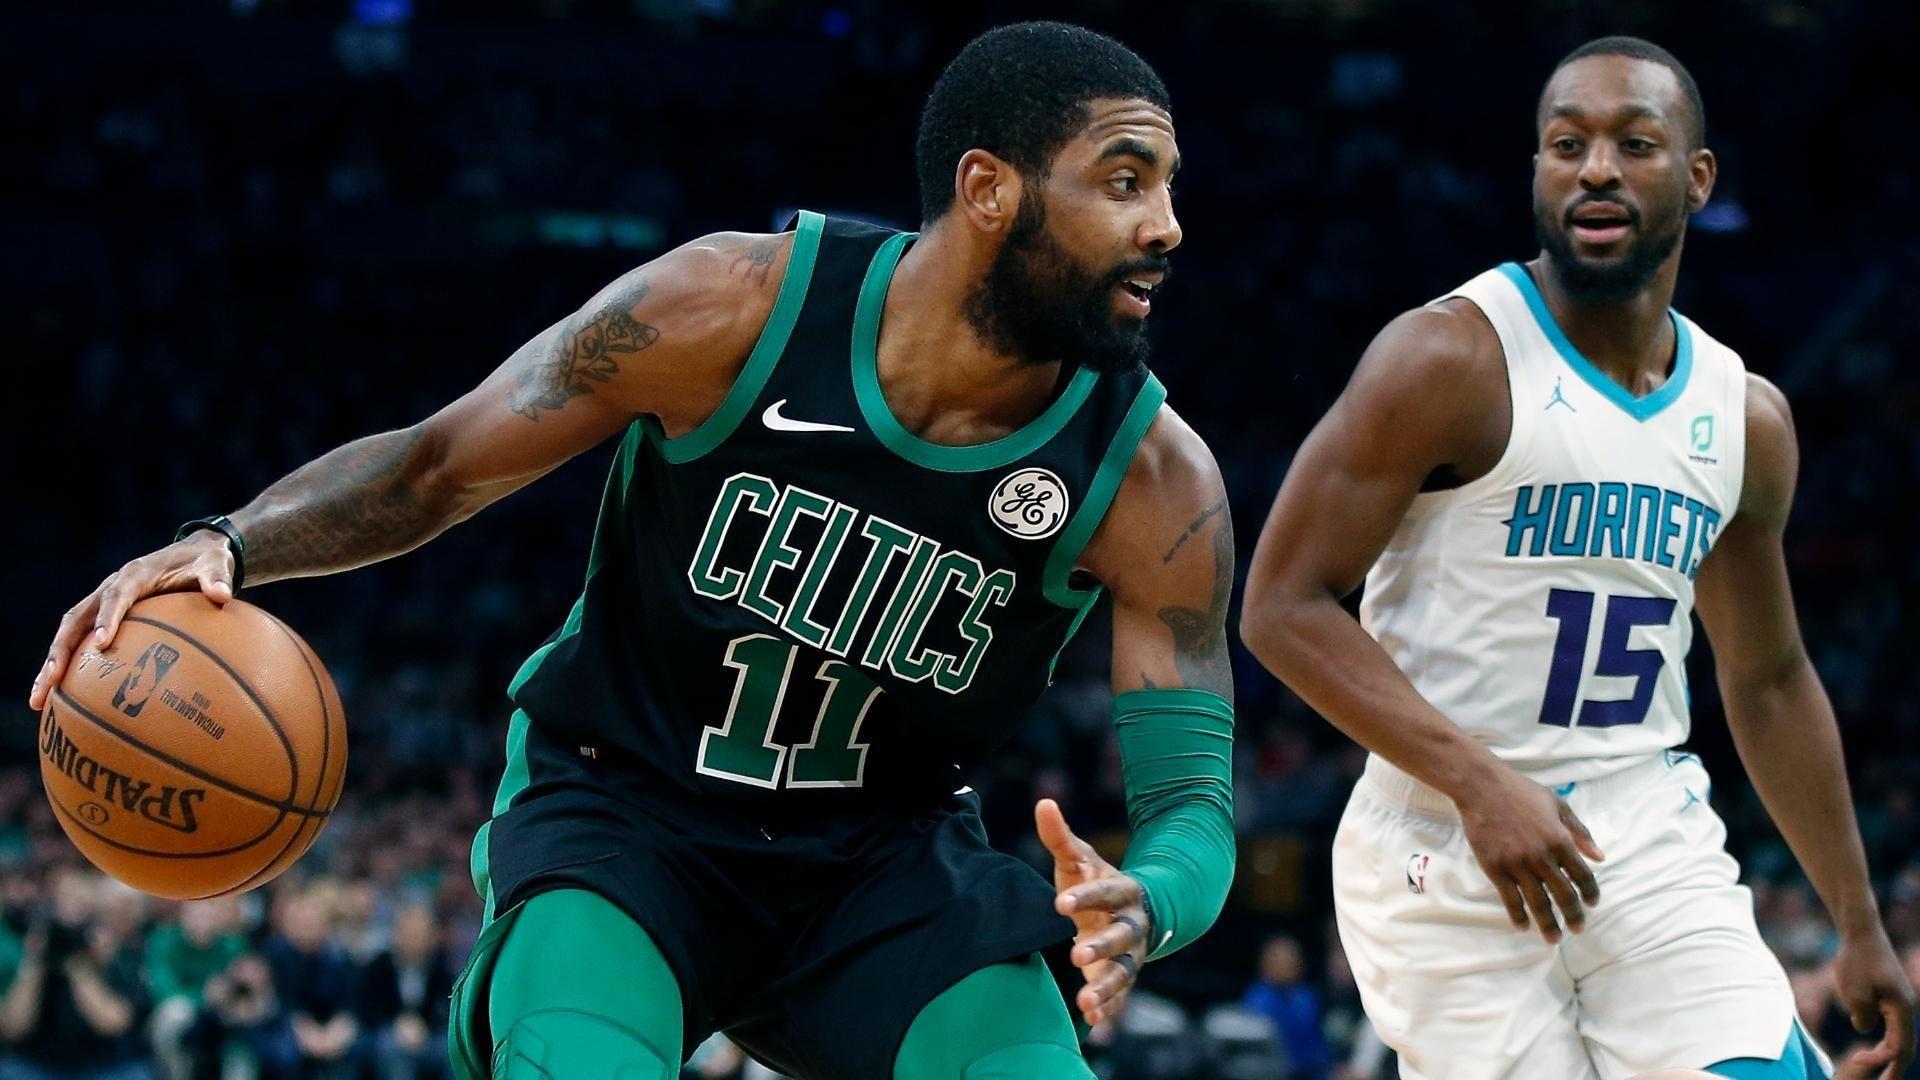 Kemba leads Hornets' comeback vs. Kyrie, Celtics